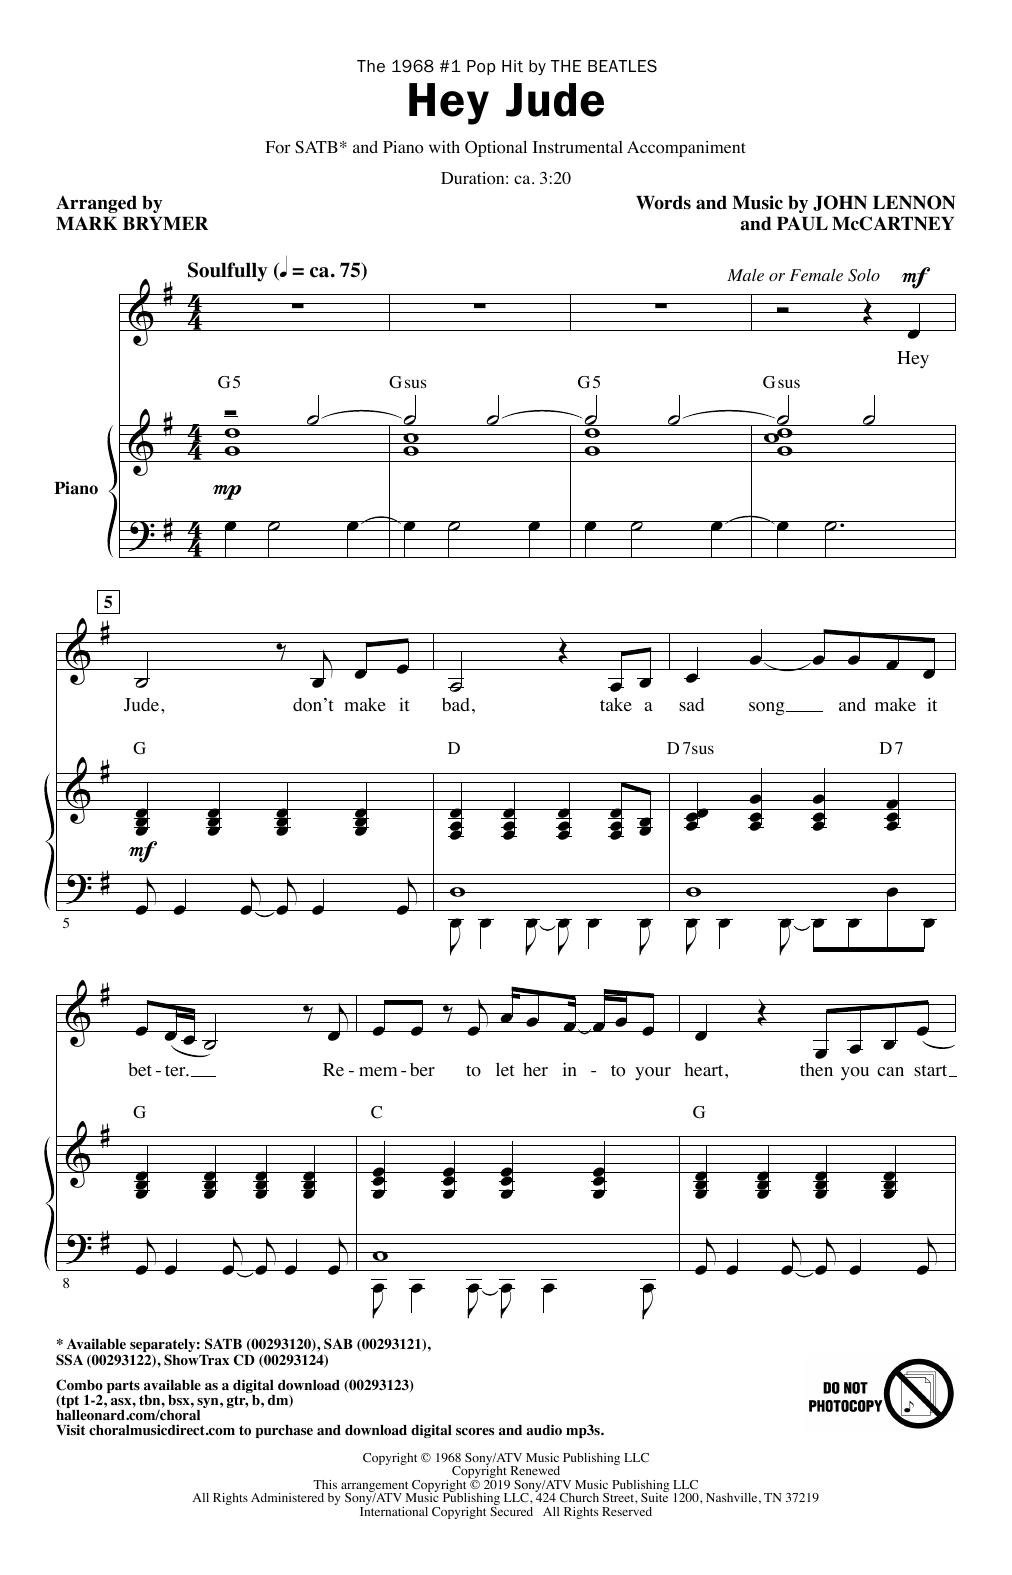 Hey Jude (arr. Mark Brymer) (SATB Choir)